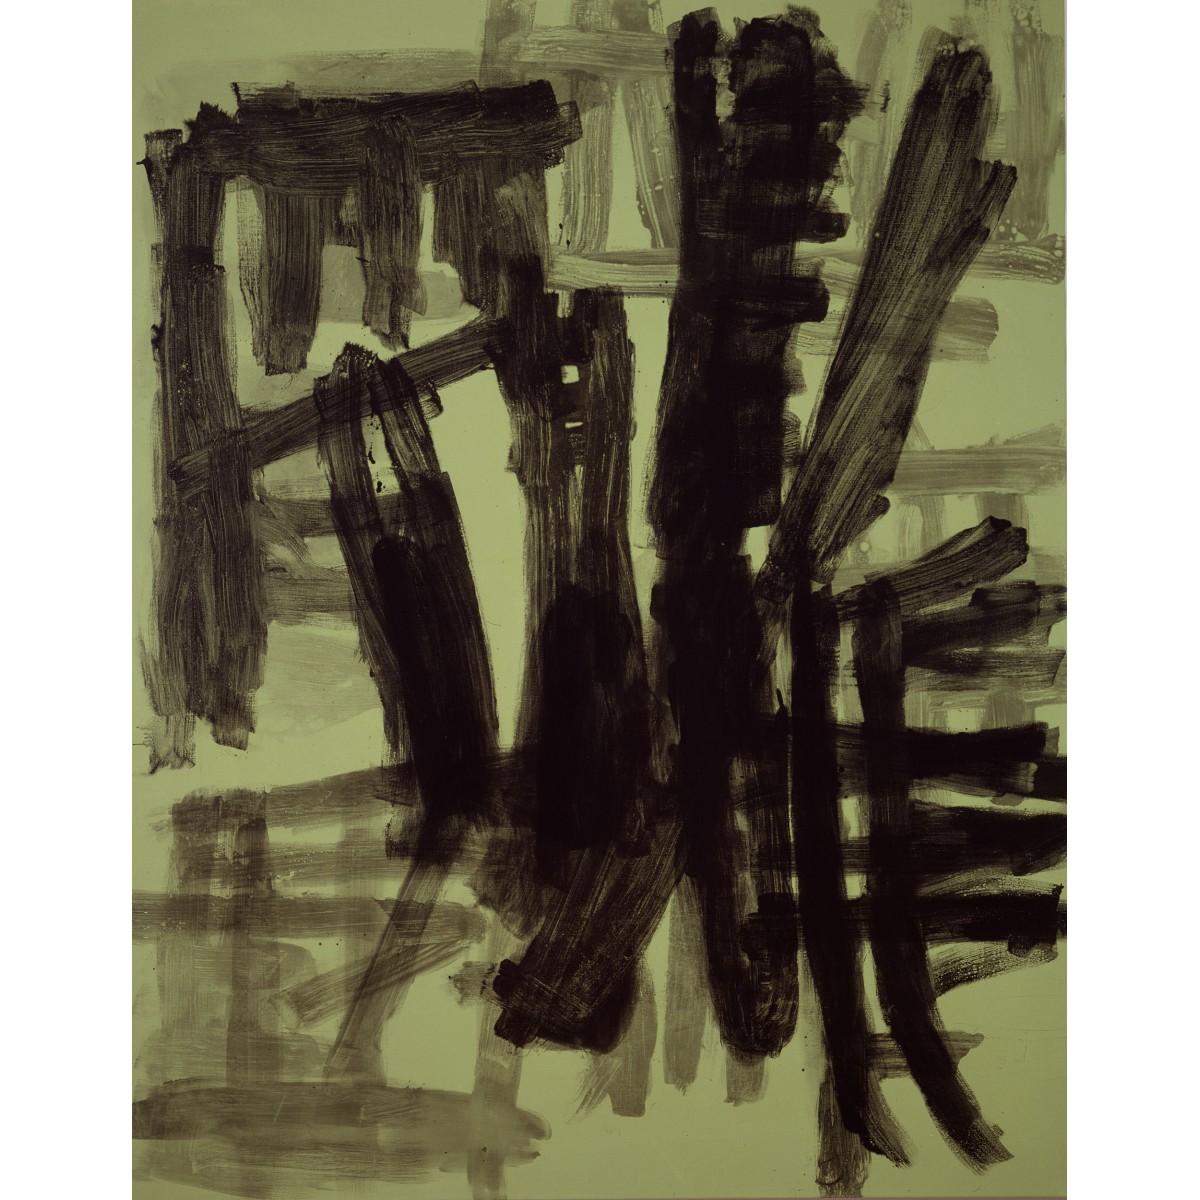 Untitled VII, 2002